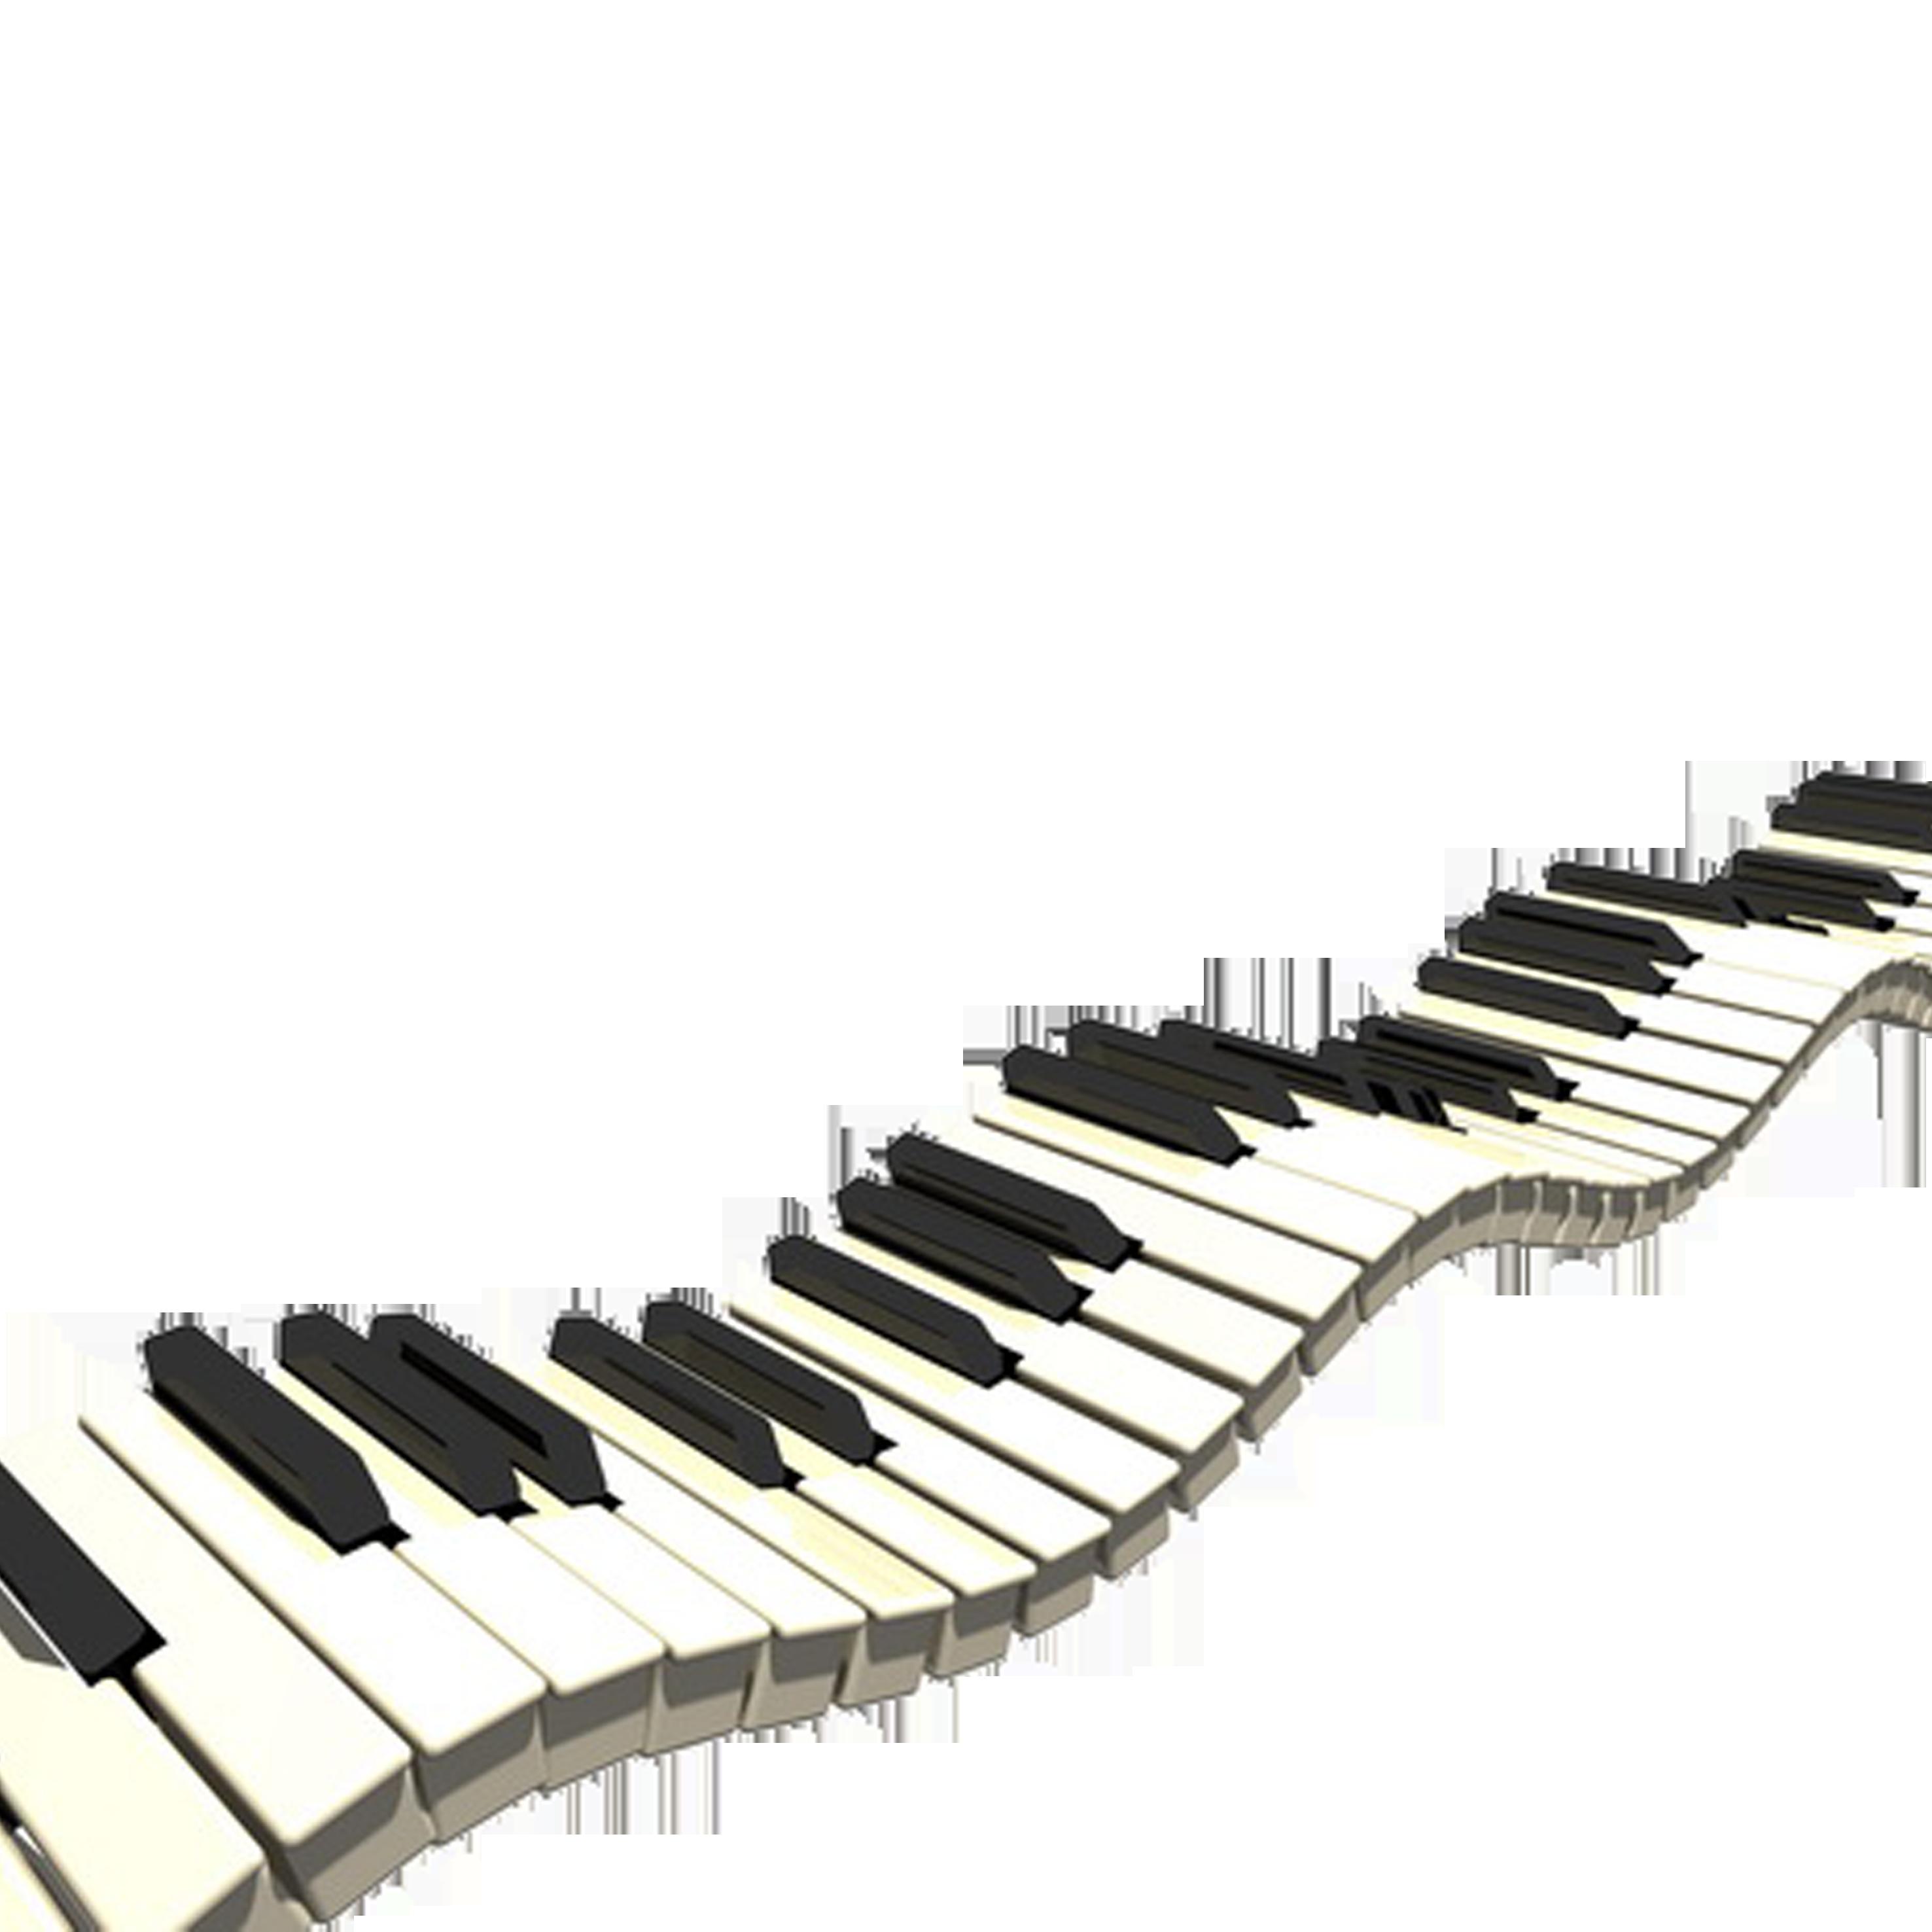 Musical keyboard clip art. Piano clipart digital piano